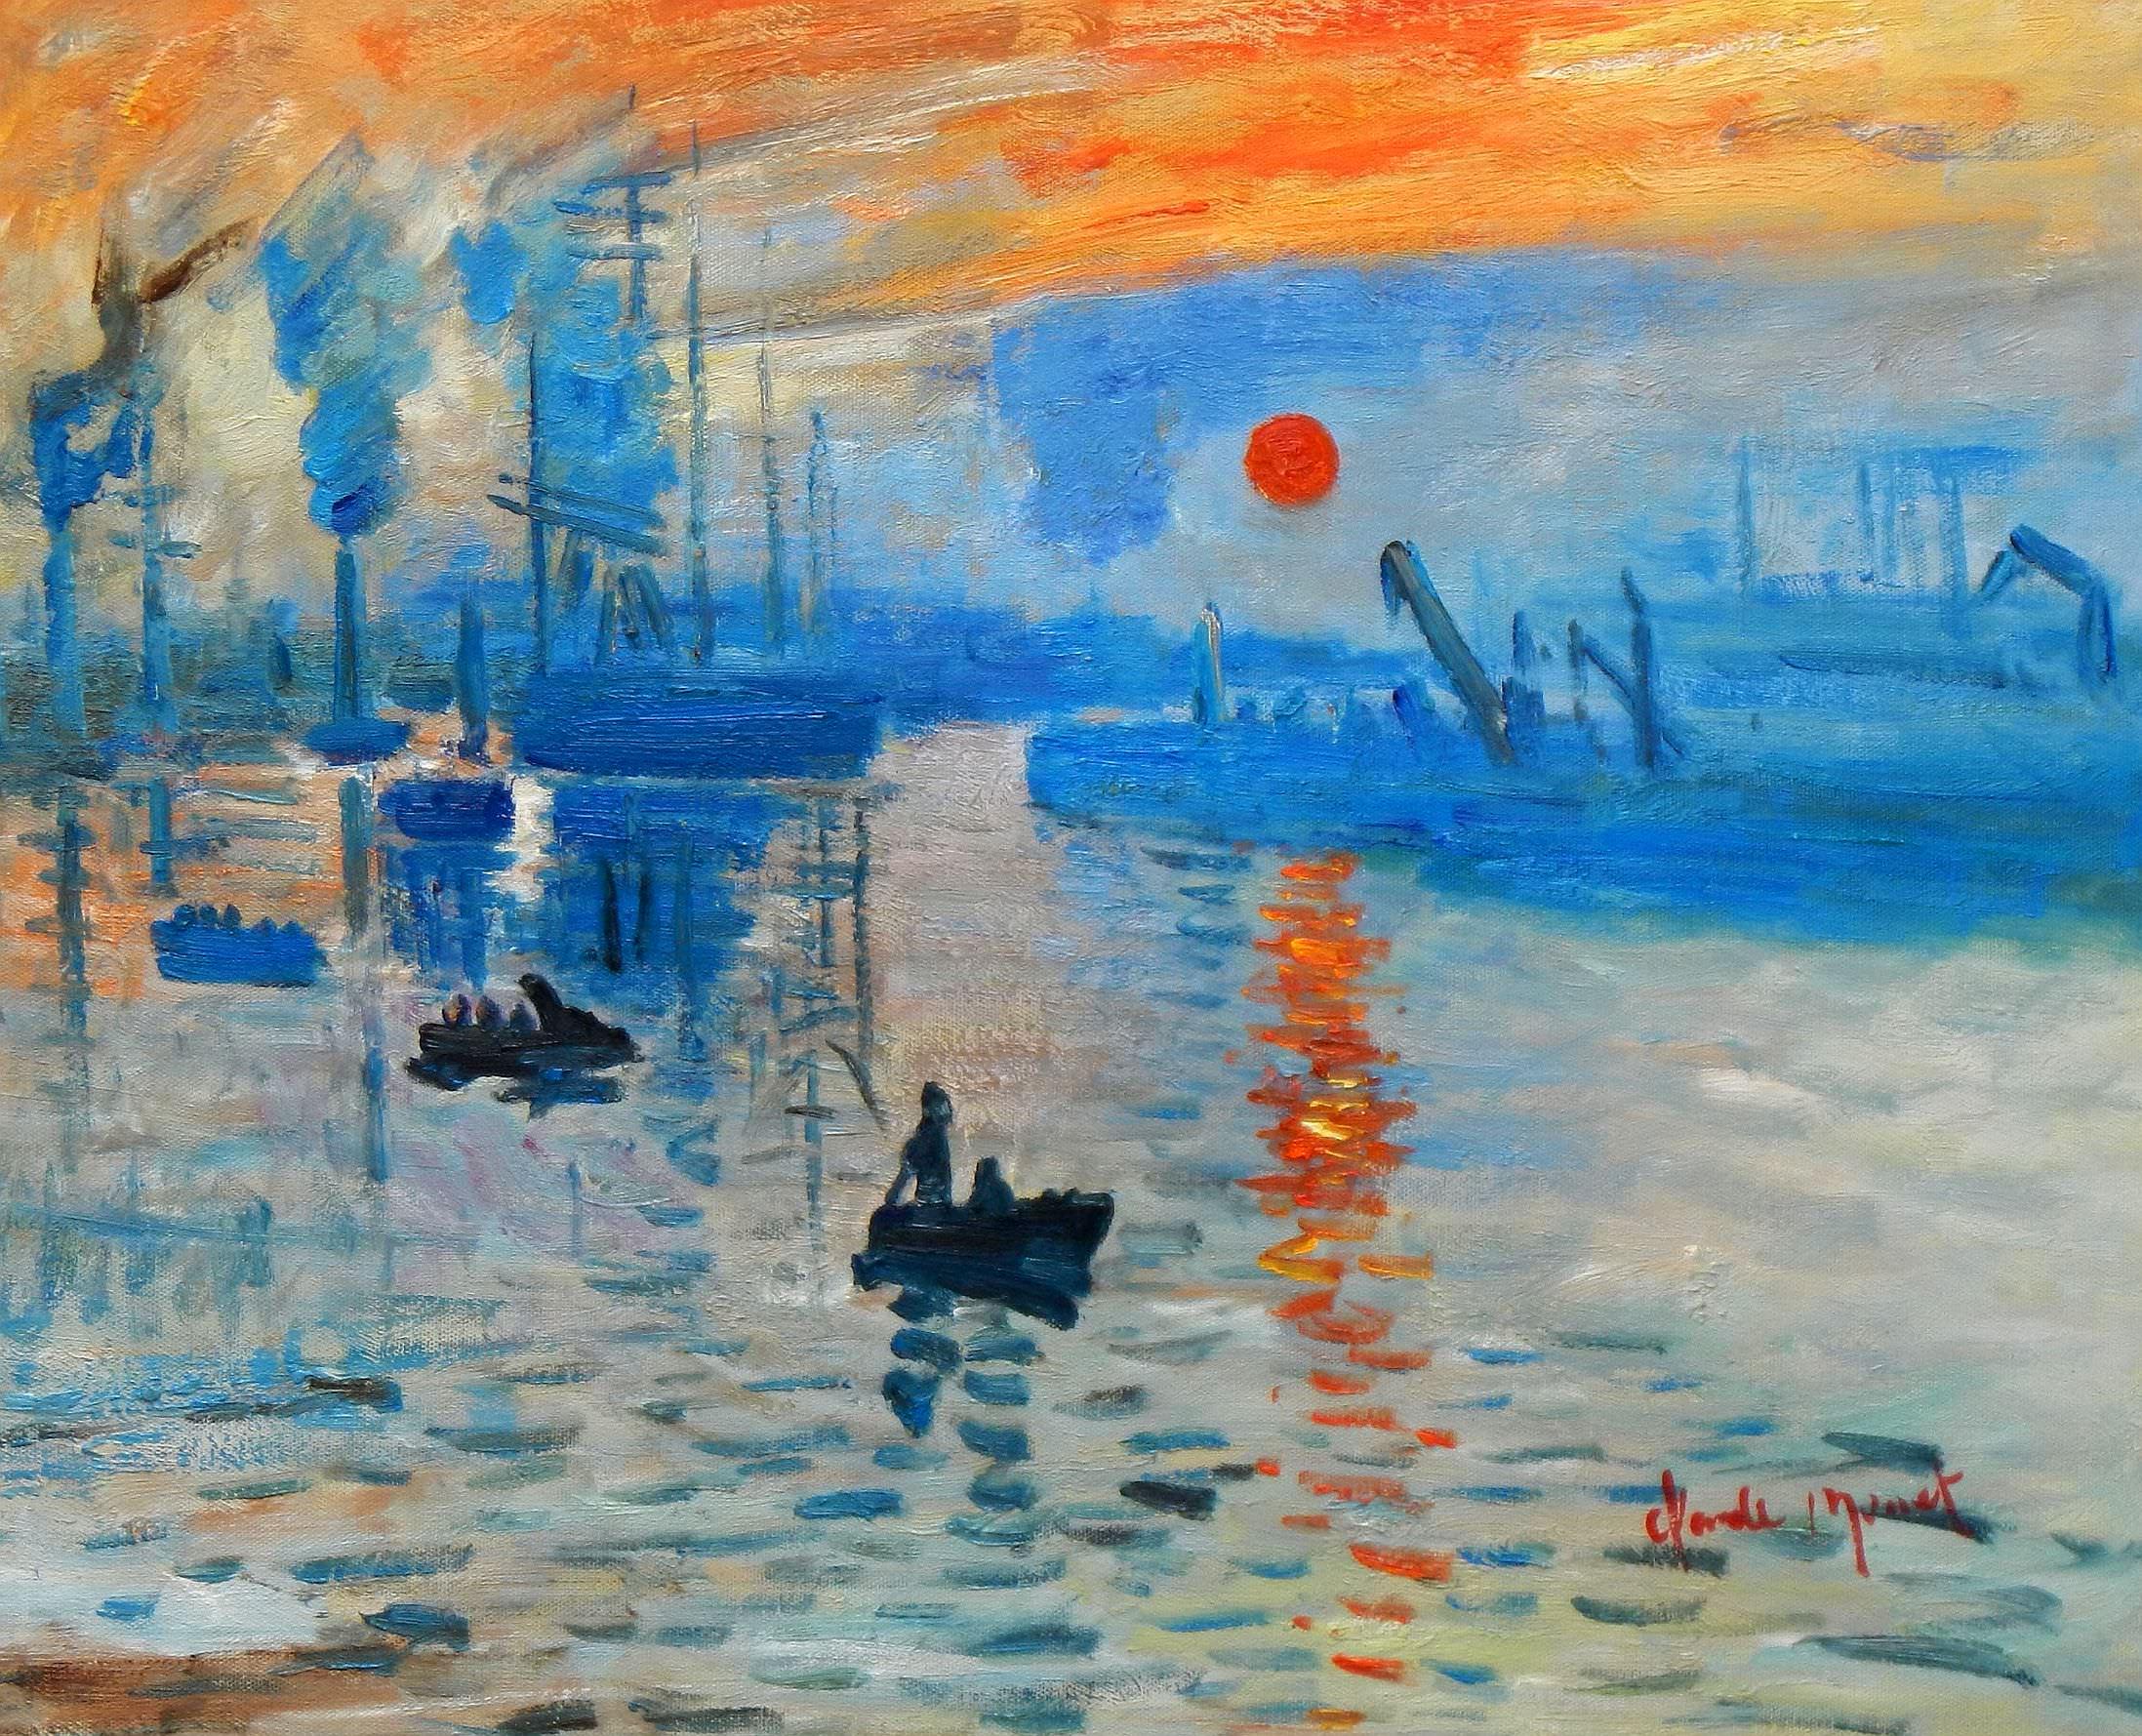 Claude Monet - Sonnenaufgang b93243 40x50cm Ölgemälde handgemalt